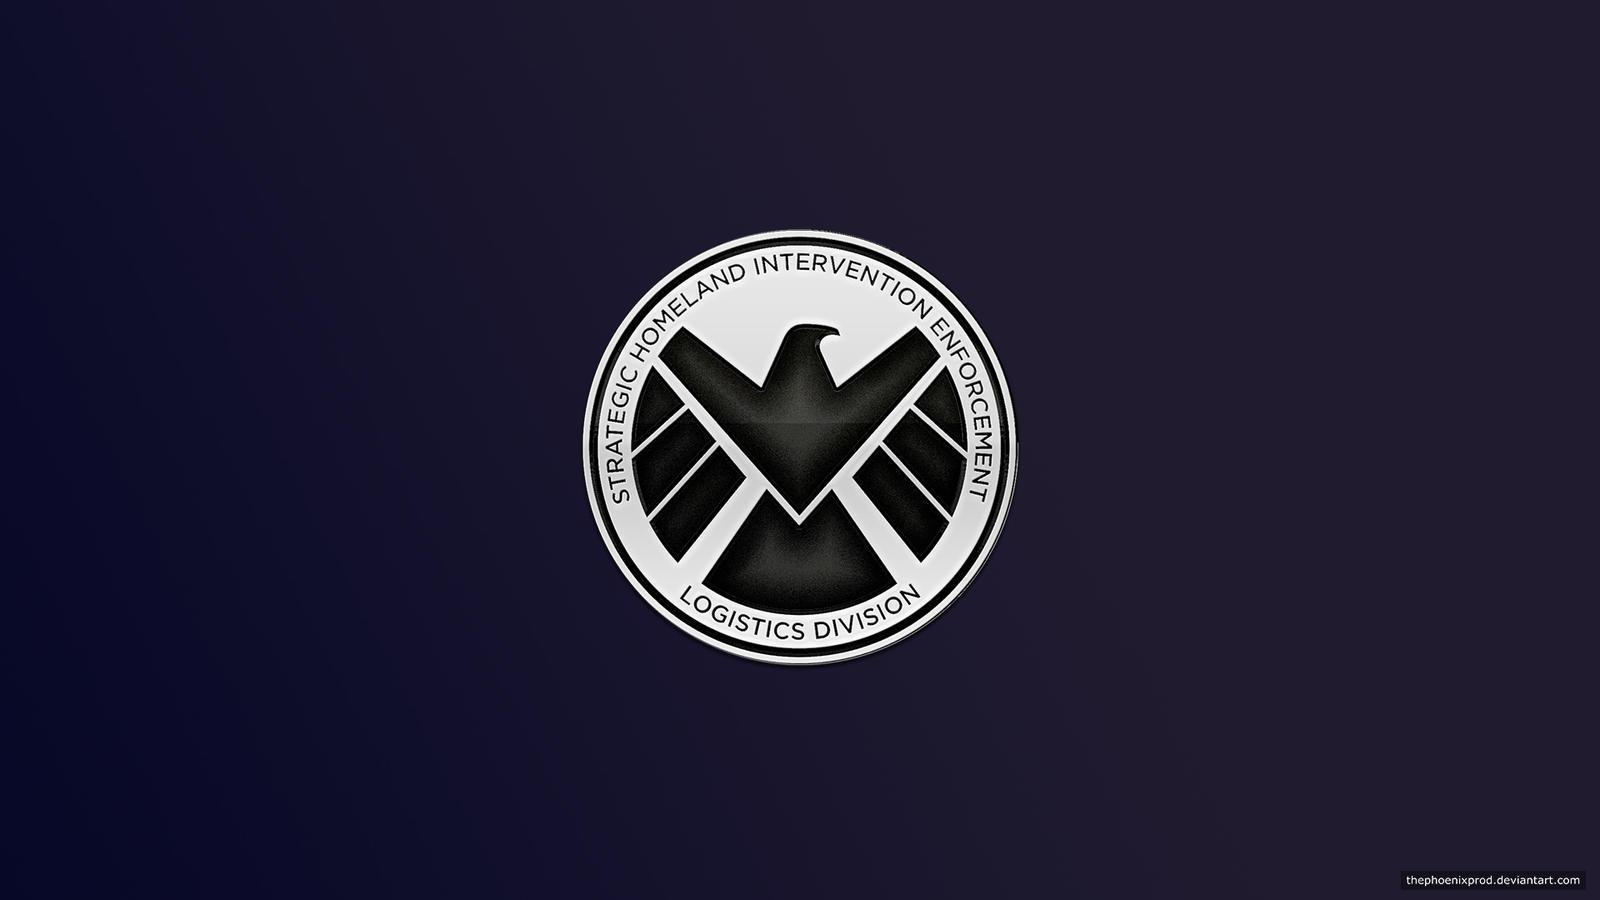 Marvel's SHIELD Wallpaper 07 by thephoenixprod on DeviantArt